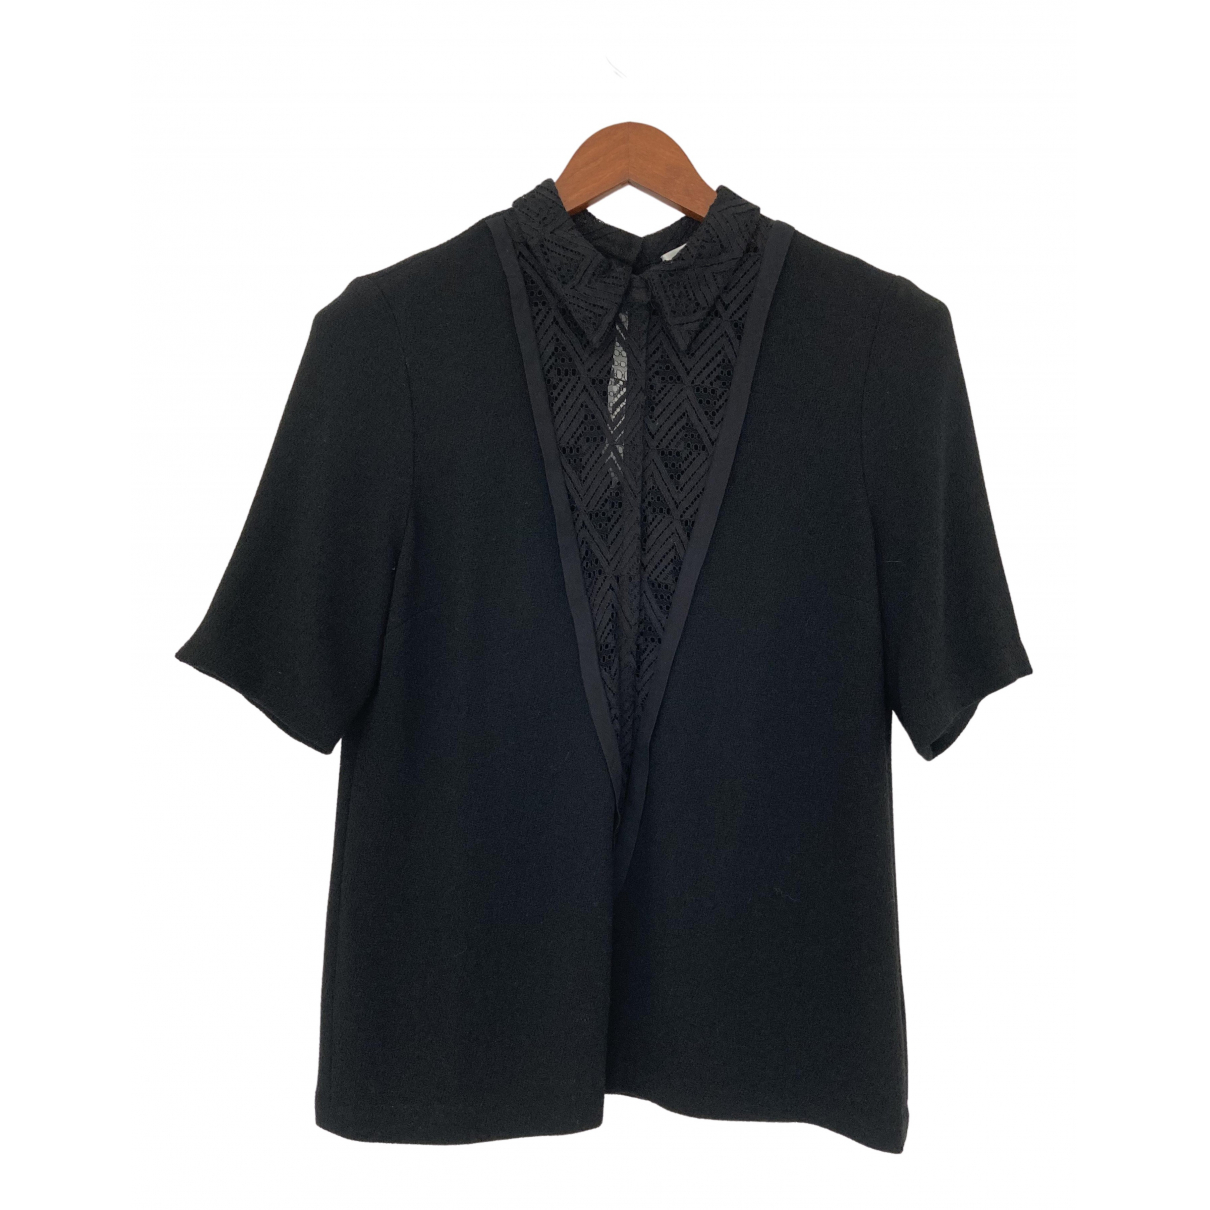 A.l.c N Black  top for Women S International